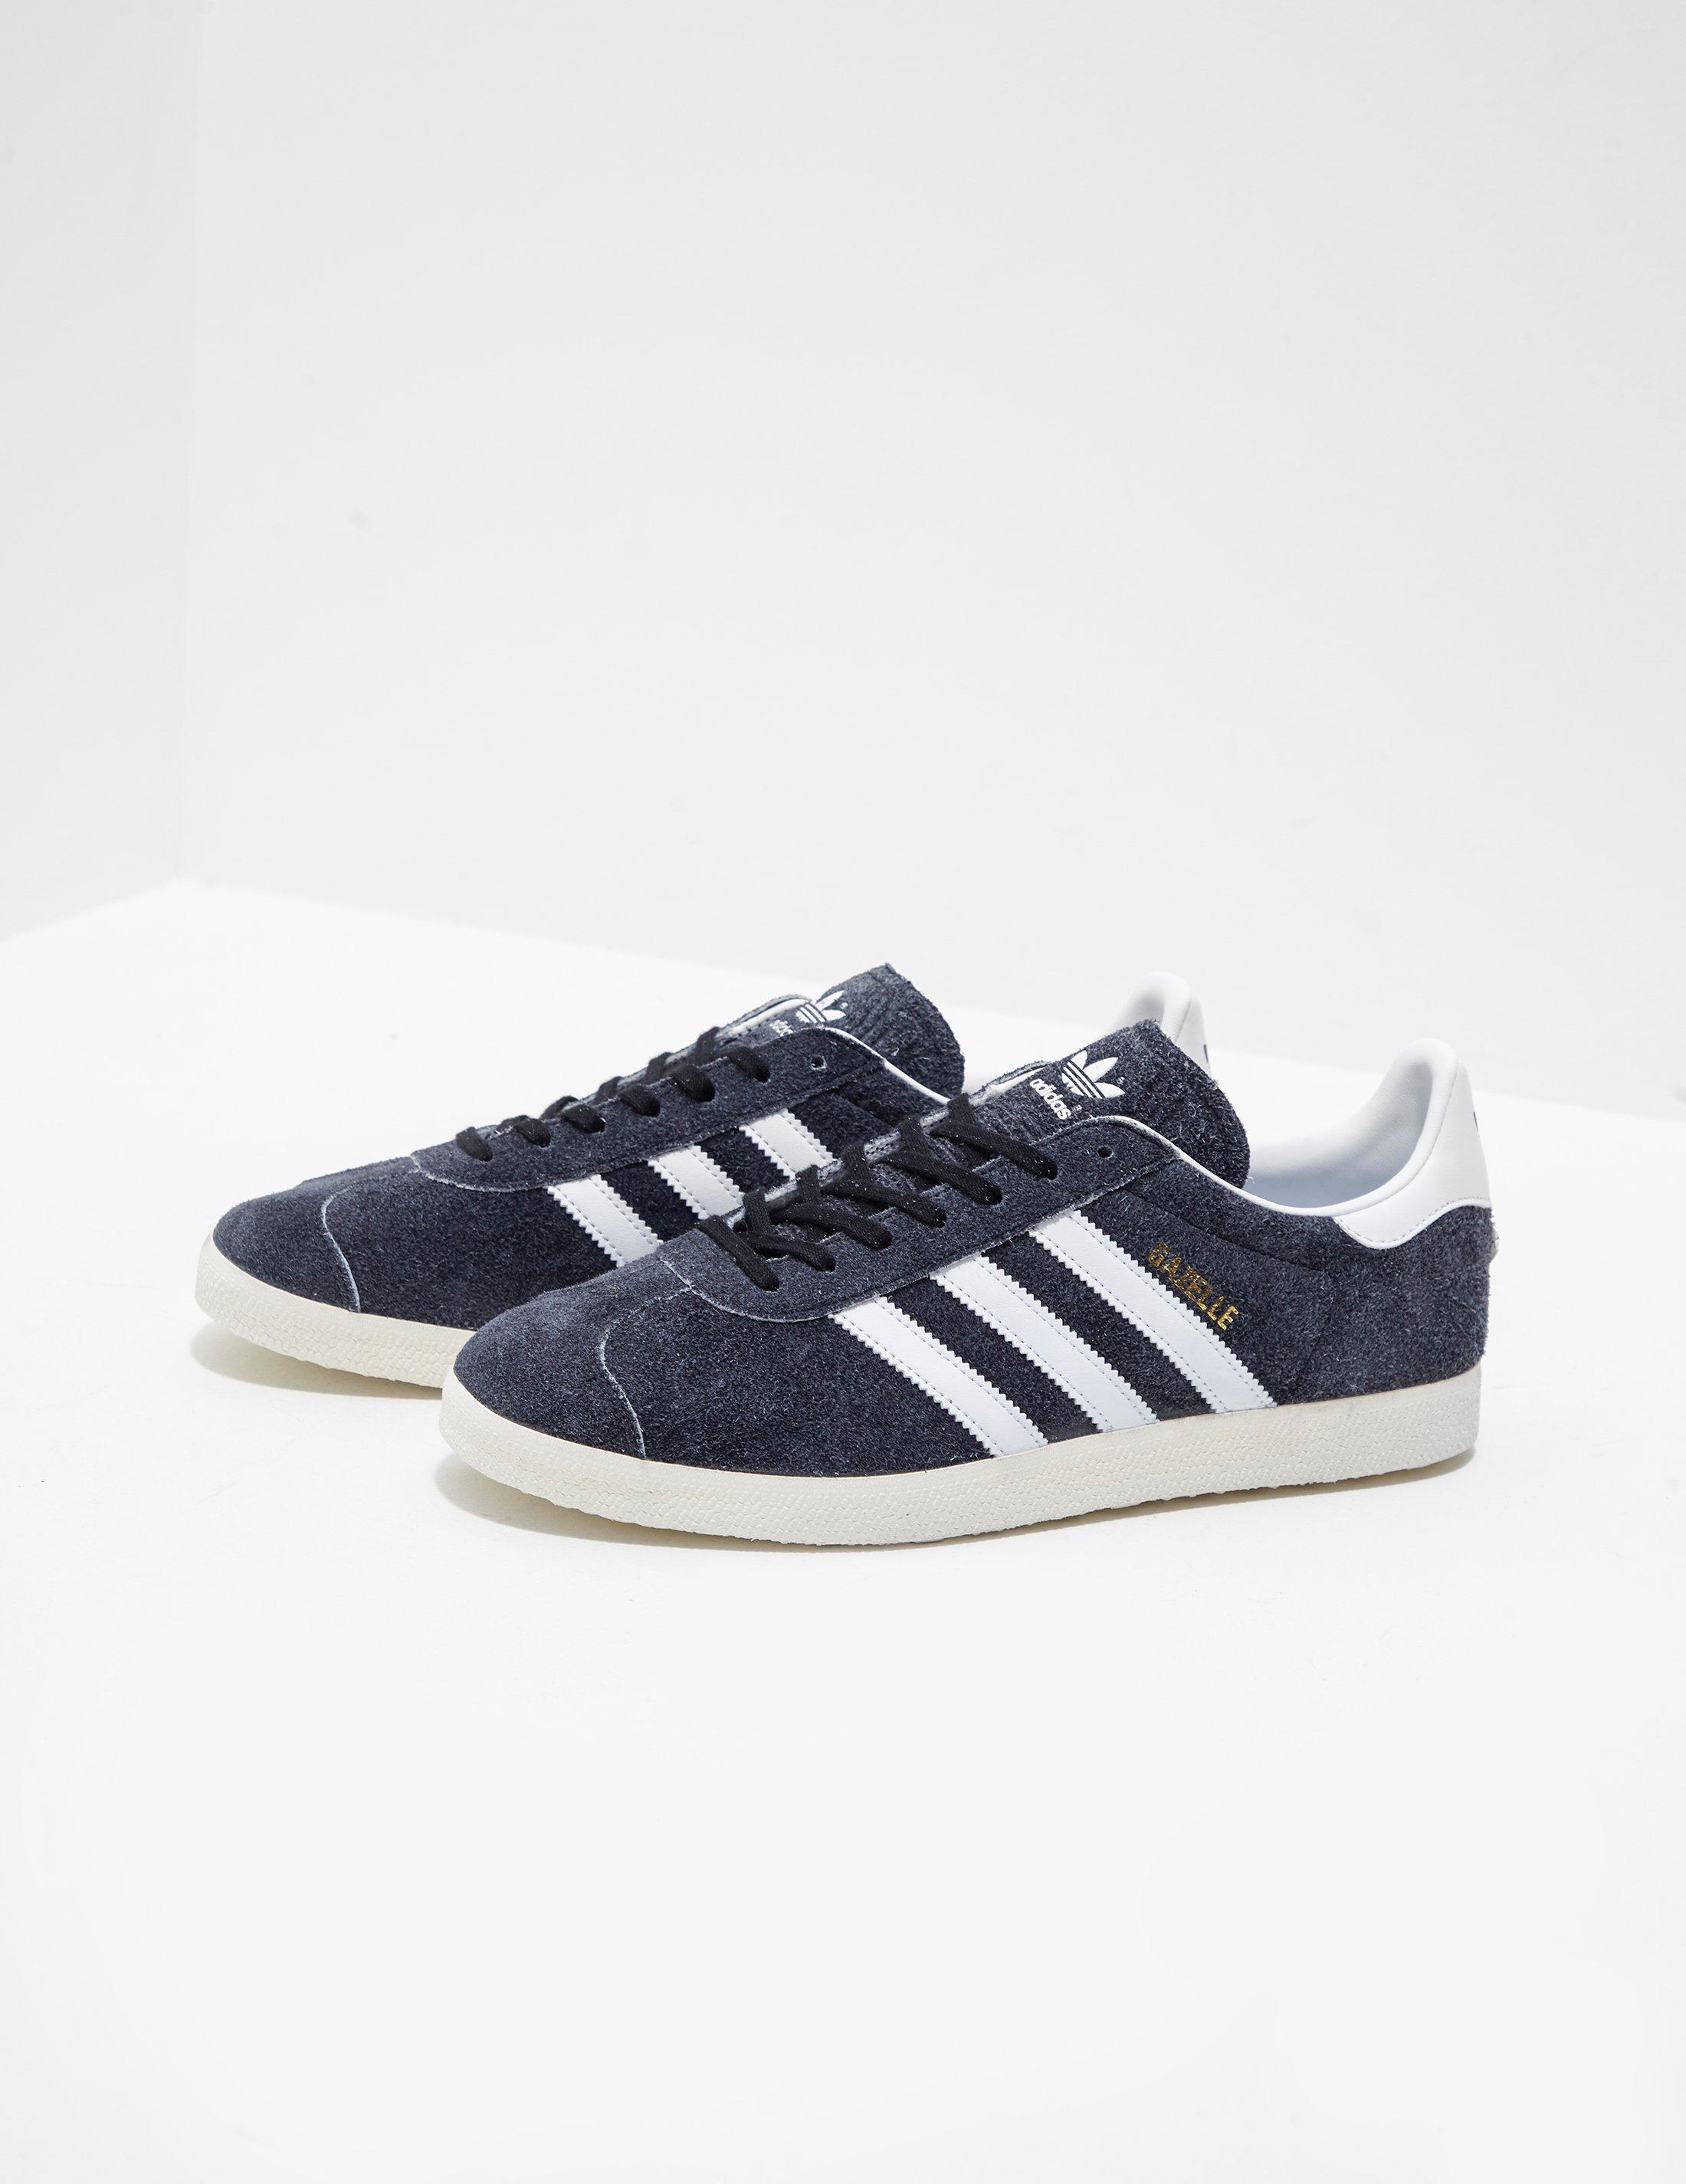 adidas Originals Gazelle Hs Black in Black for Men - Lyst 92bdb3c8ddaca